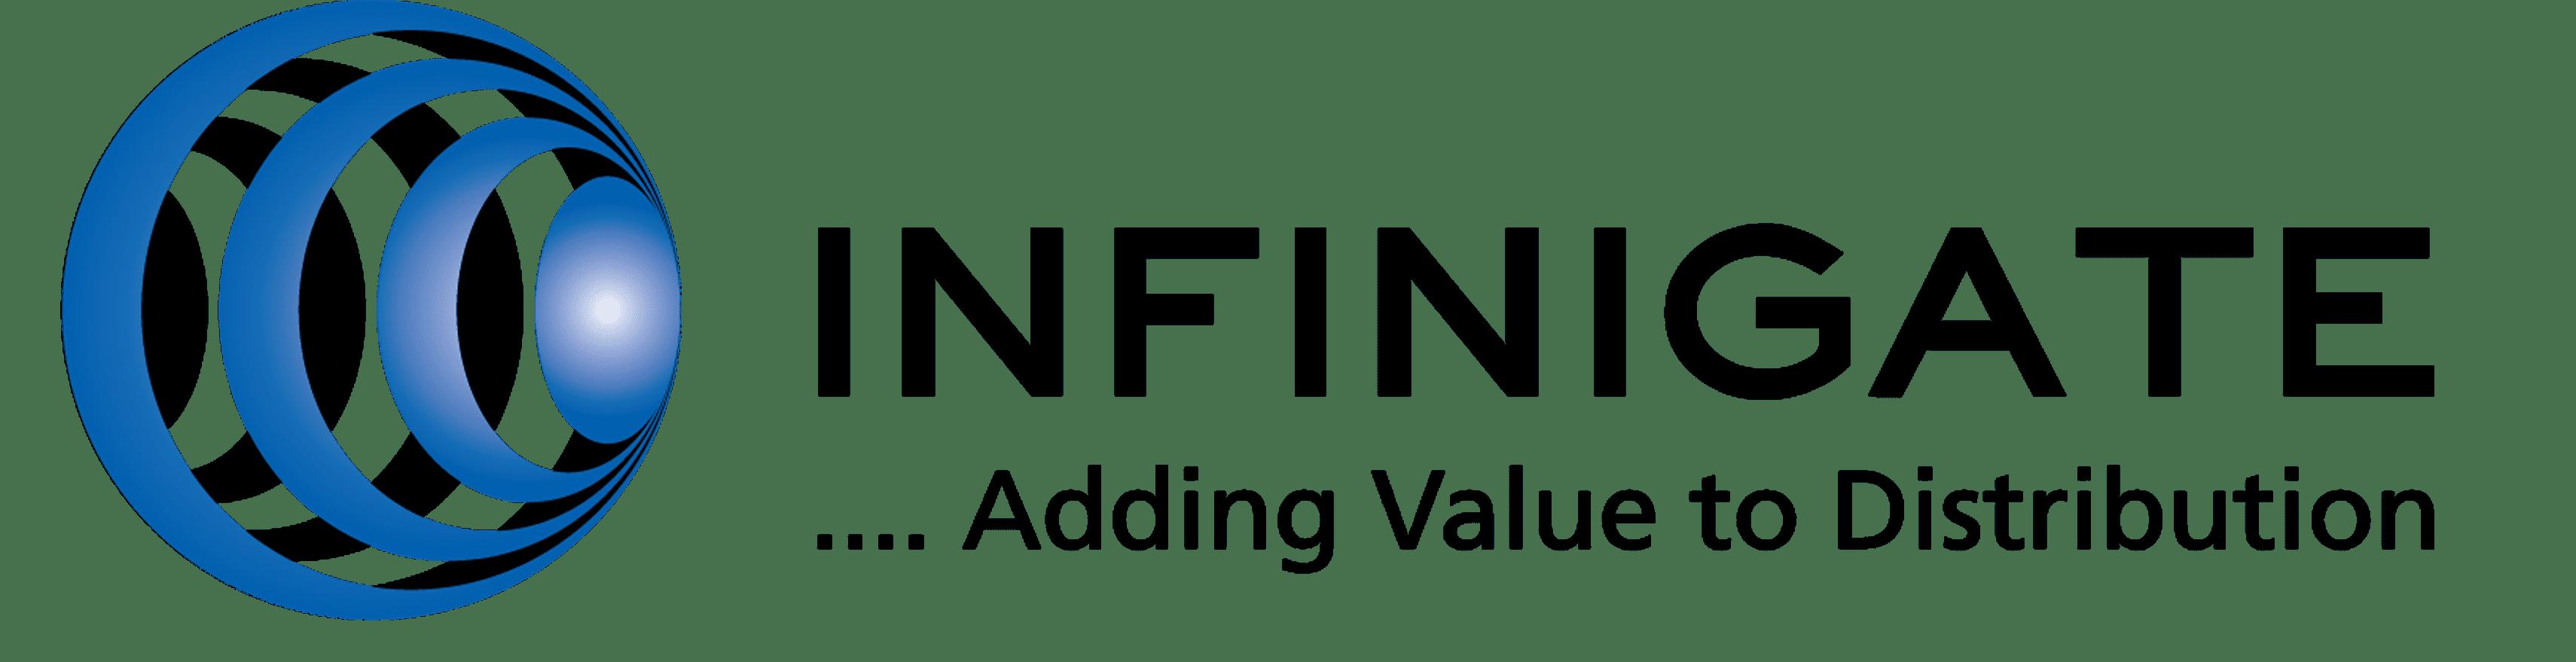 infinigate-1